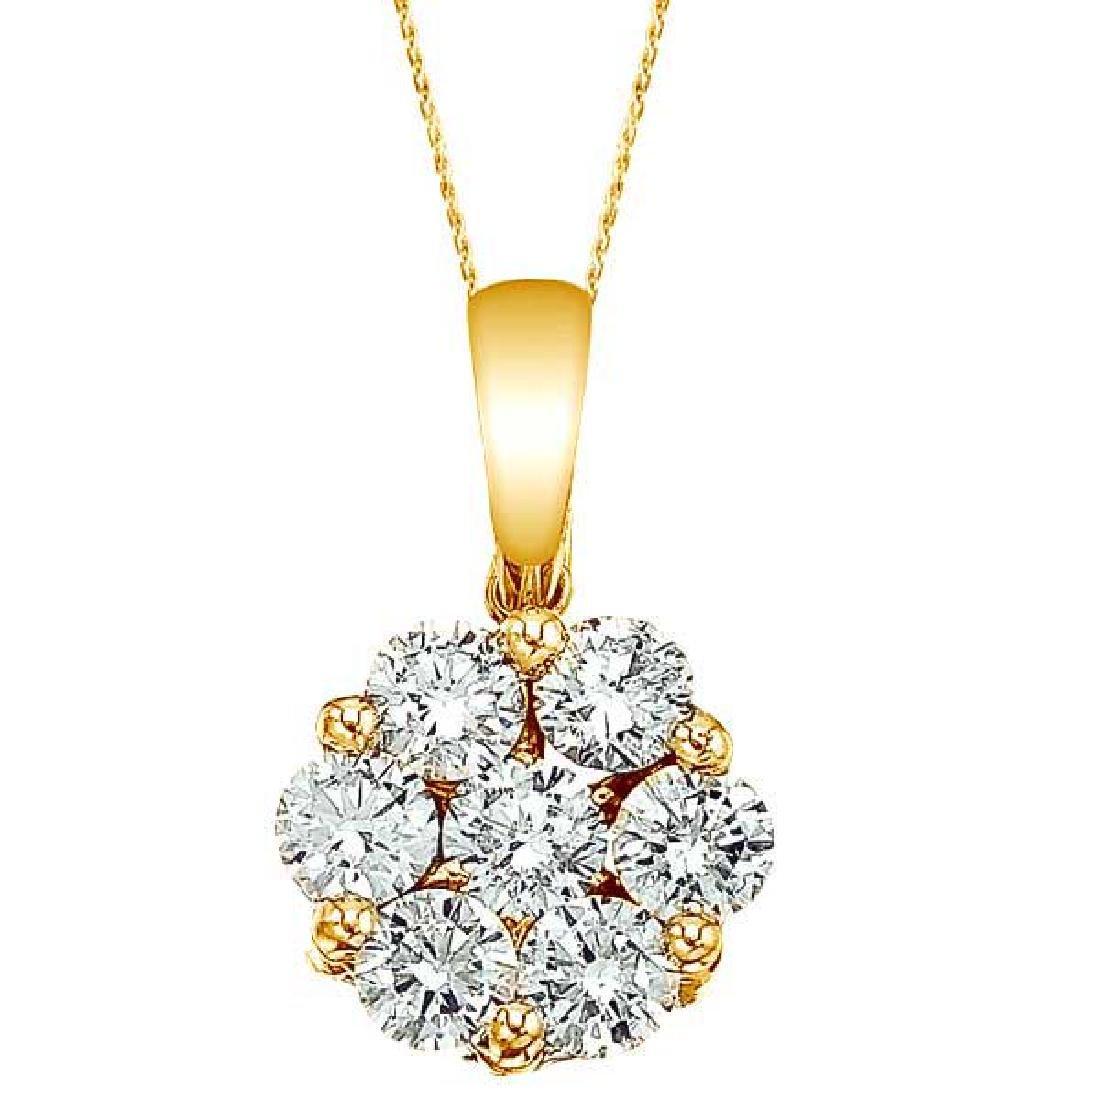 Diamond Cluster Flower Pendant Necklace in 14k Yello Go